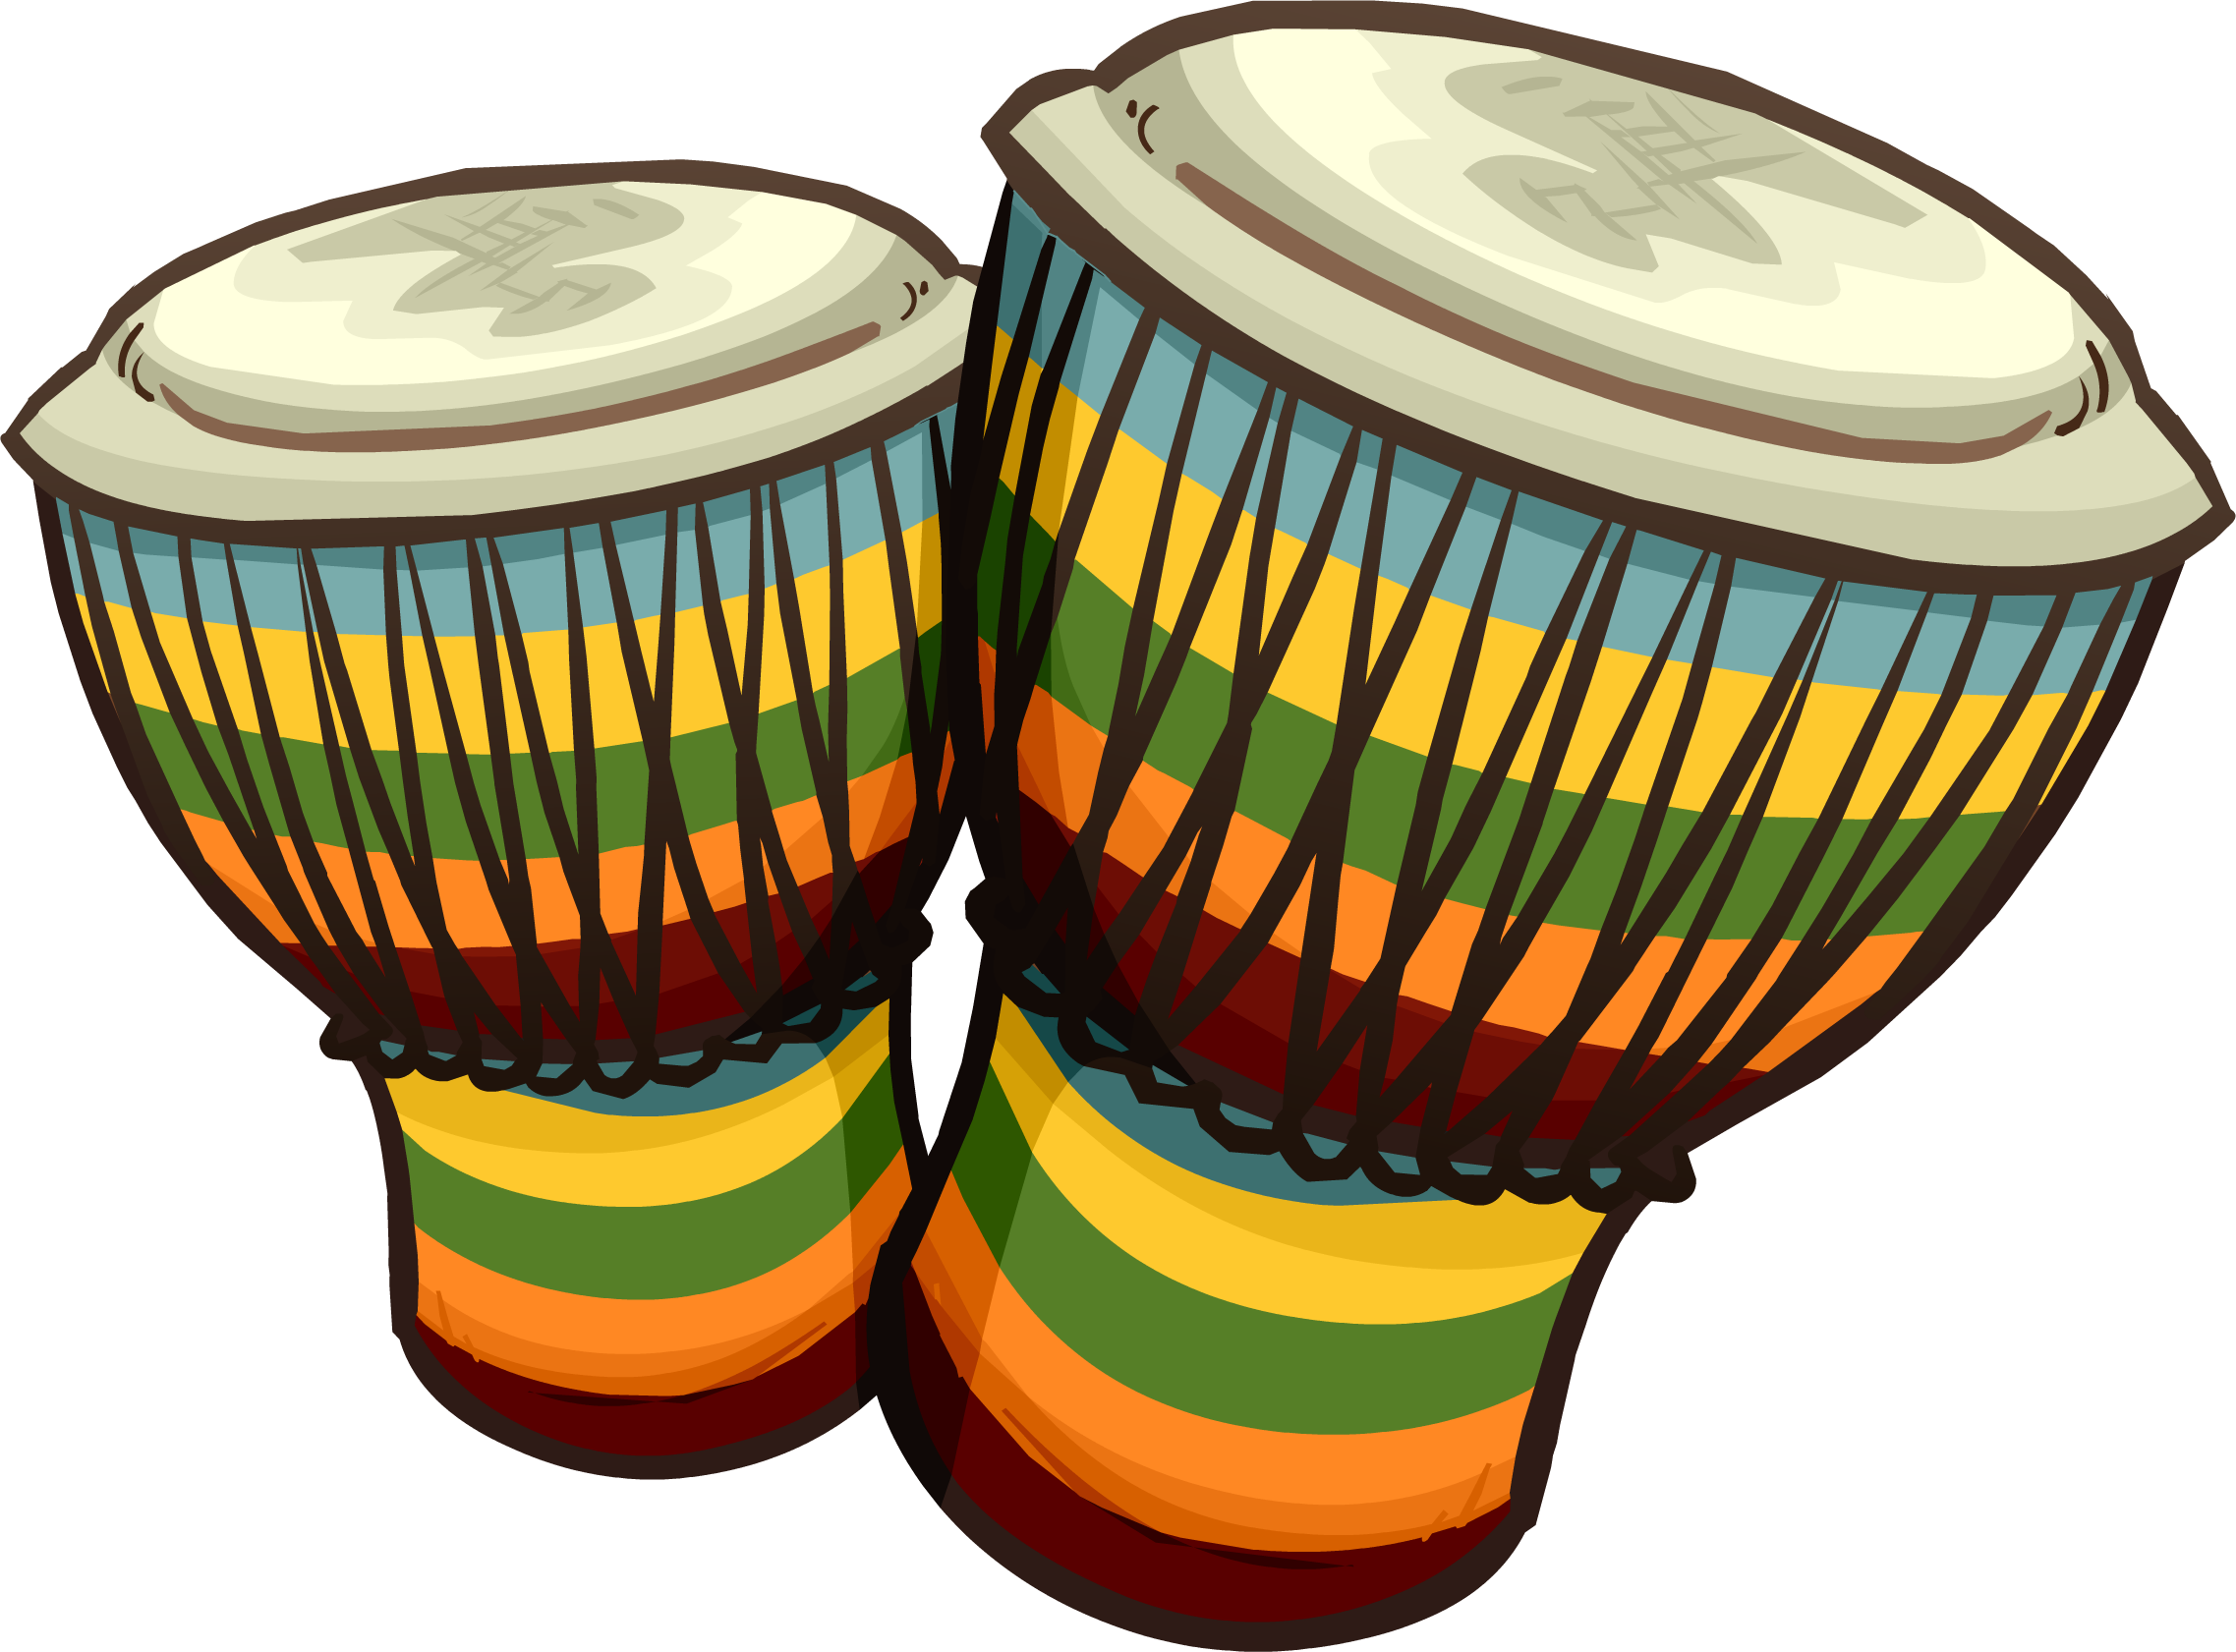 African clipart drum african. Bongo conga djembe clip